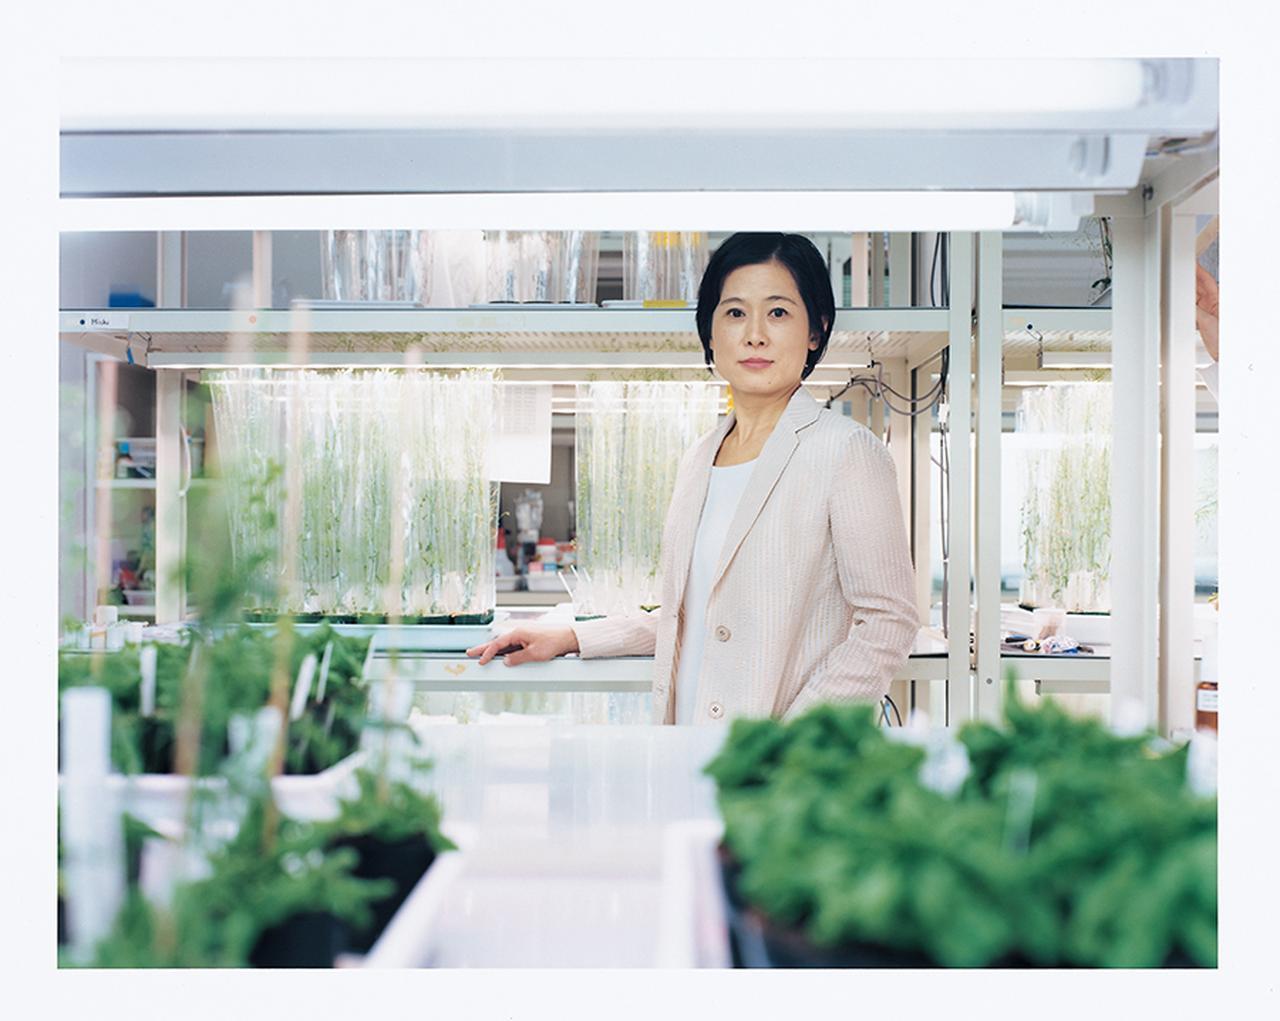 Images : 杉本慶子(植物細胞生物学者)